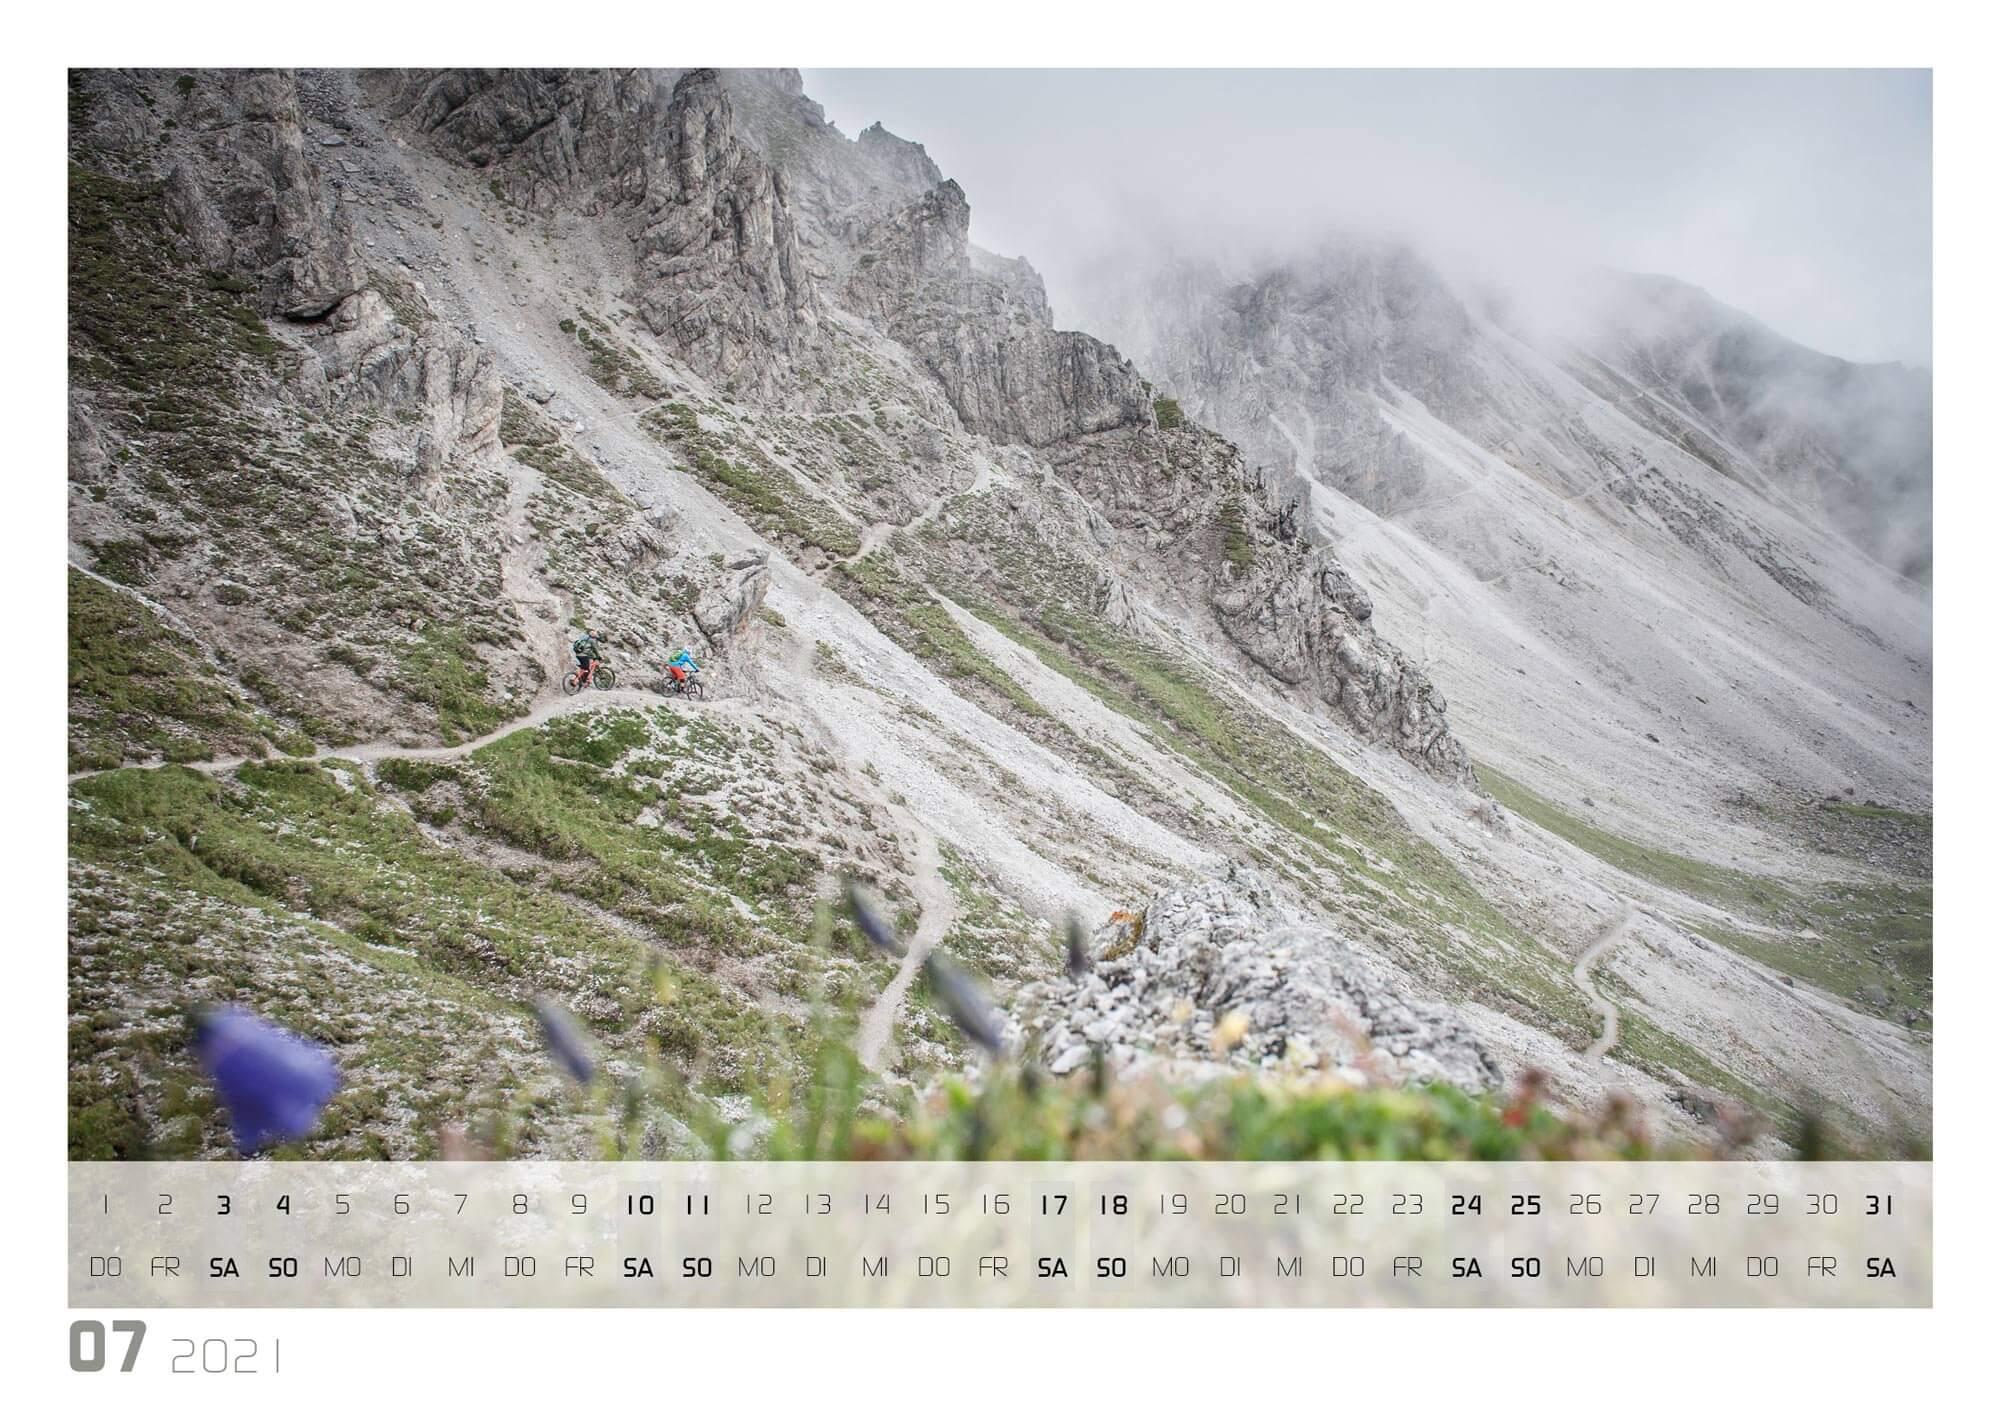 Bikefex Kalendar Rene Sendlhofer-Schag I alpinonline